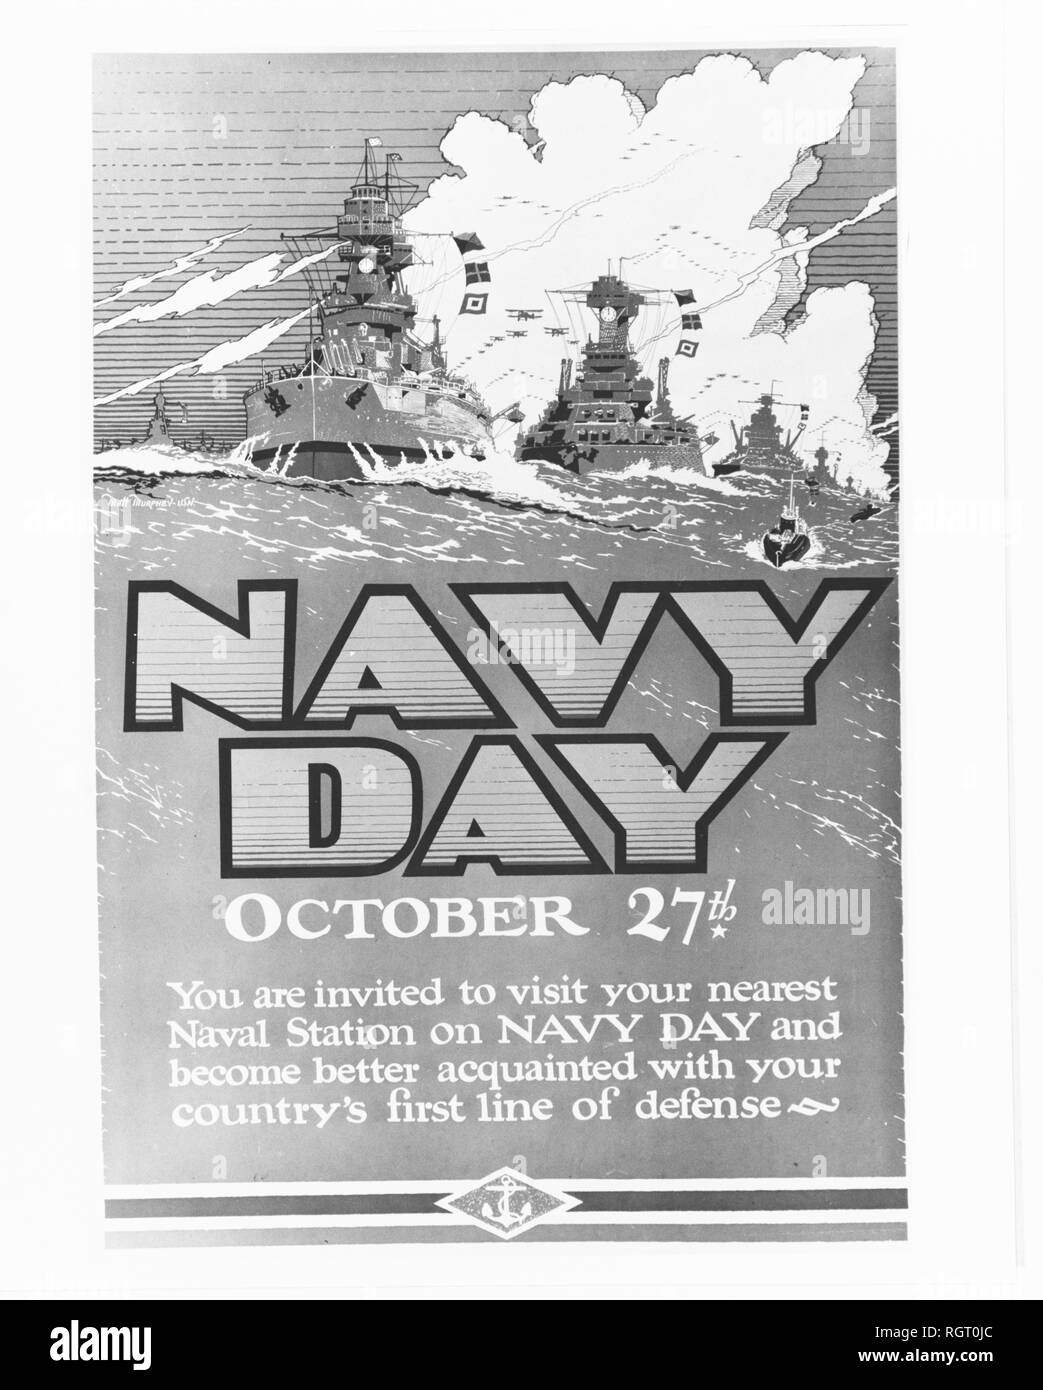 Navy Day poster 1939.jpg - RGT0JC 1RGT0JC - Stock Image